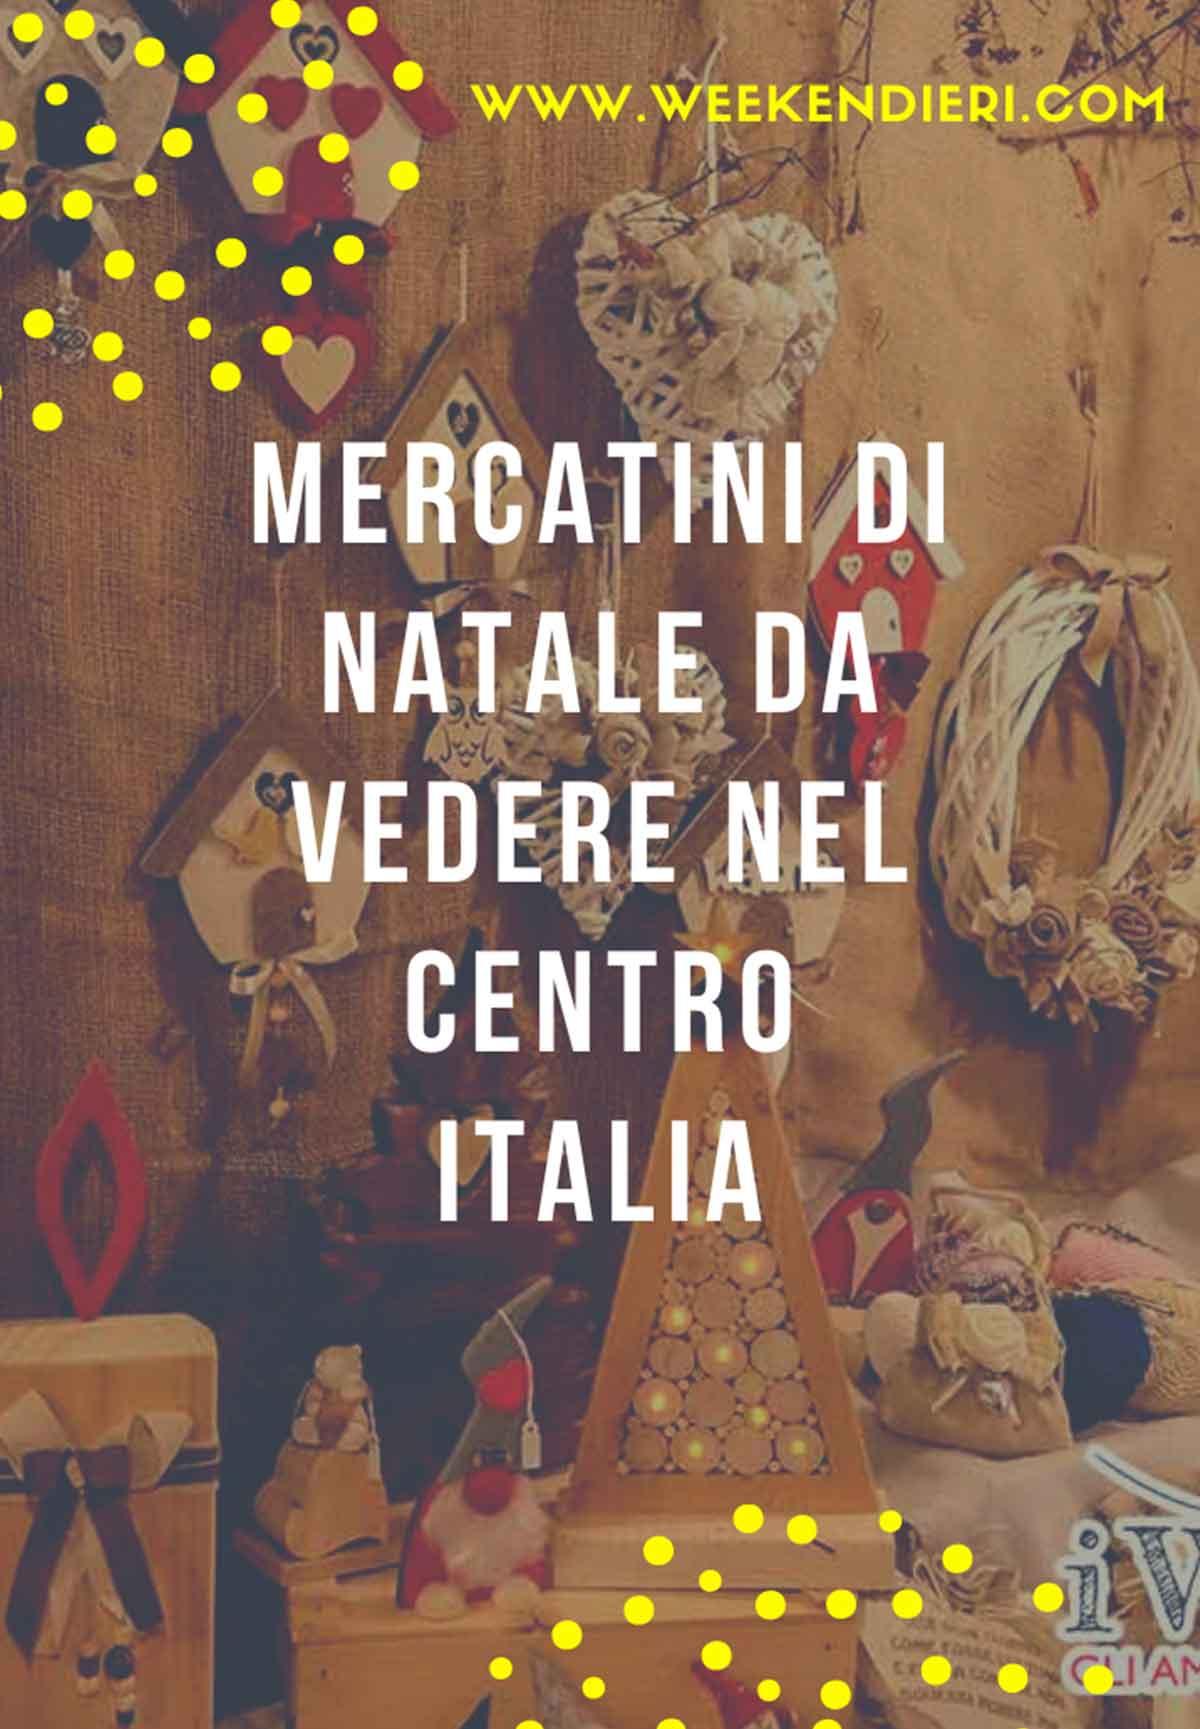 mercatini natale centro italia